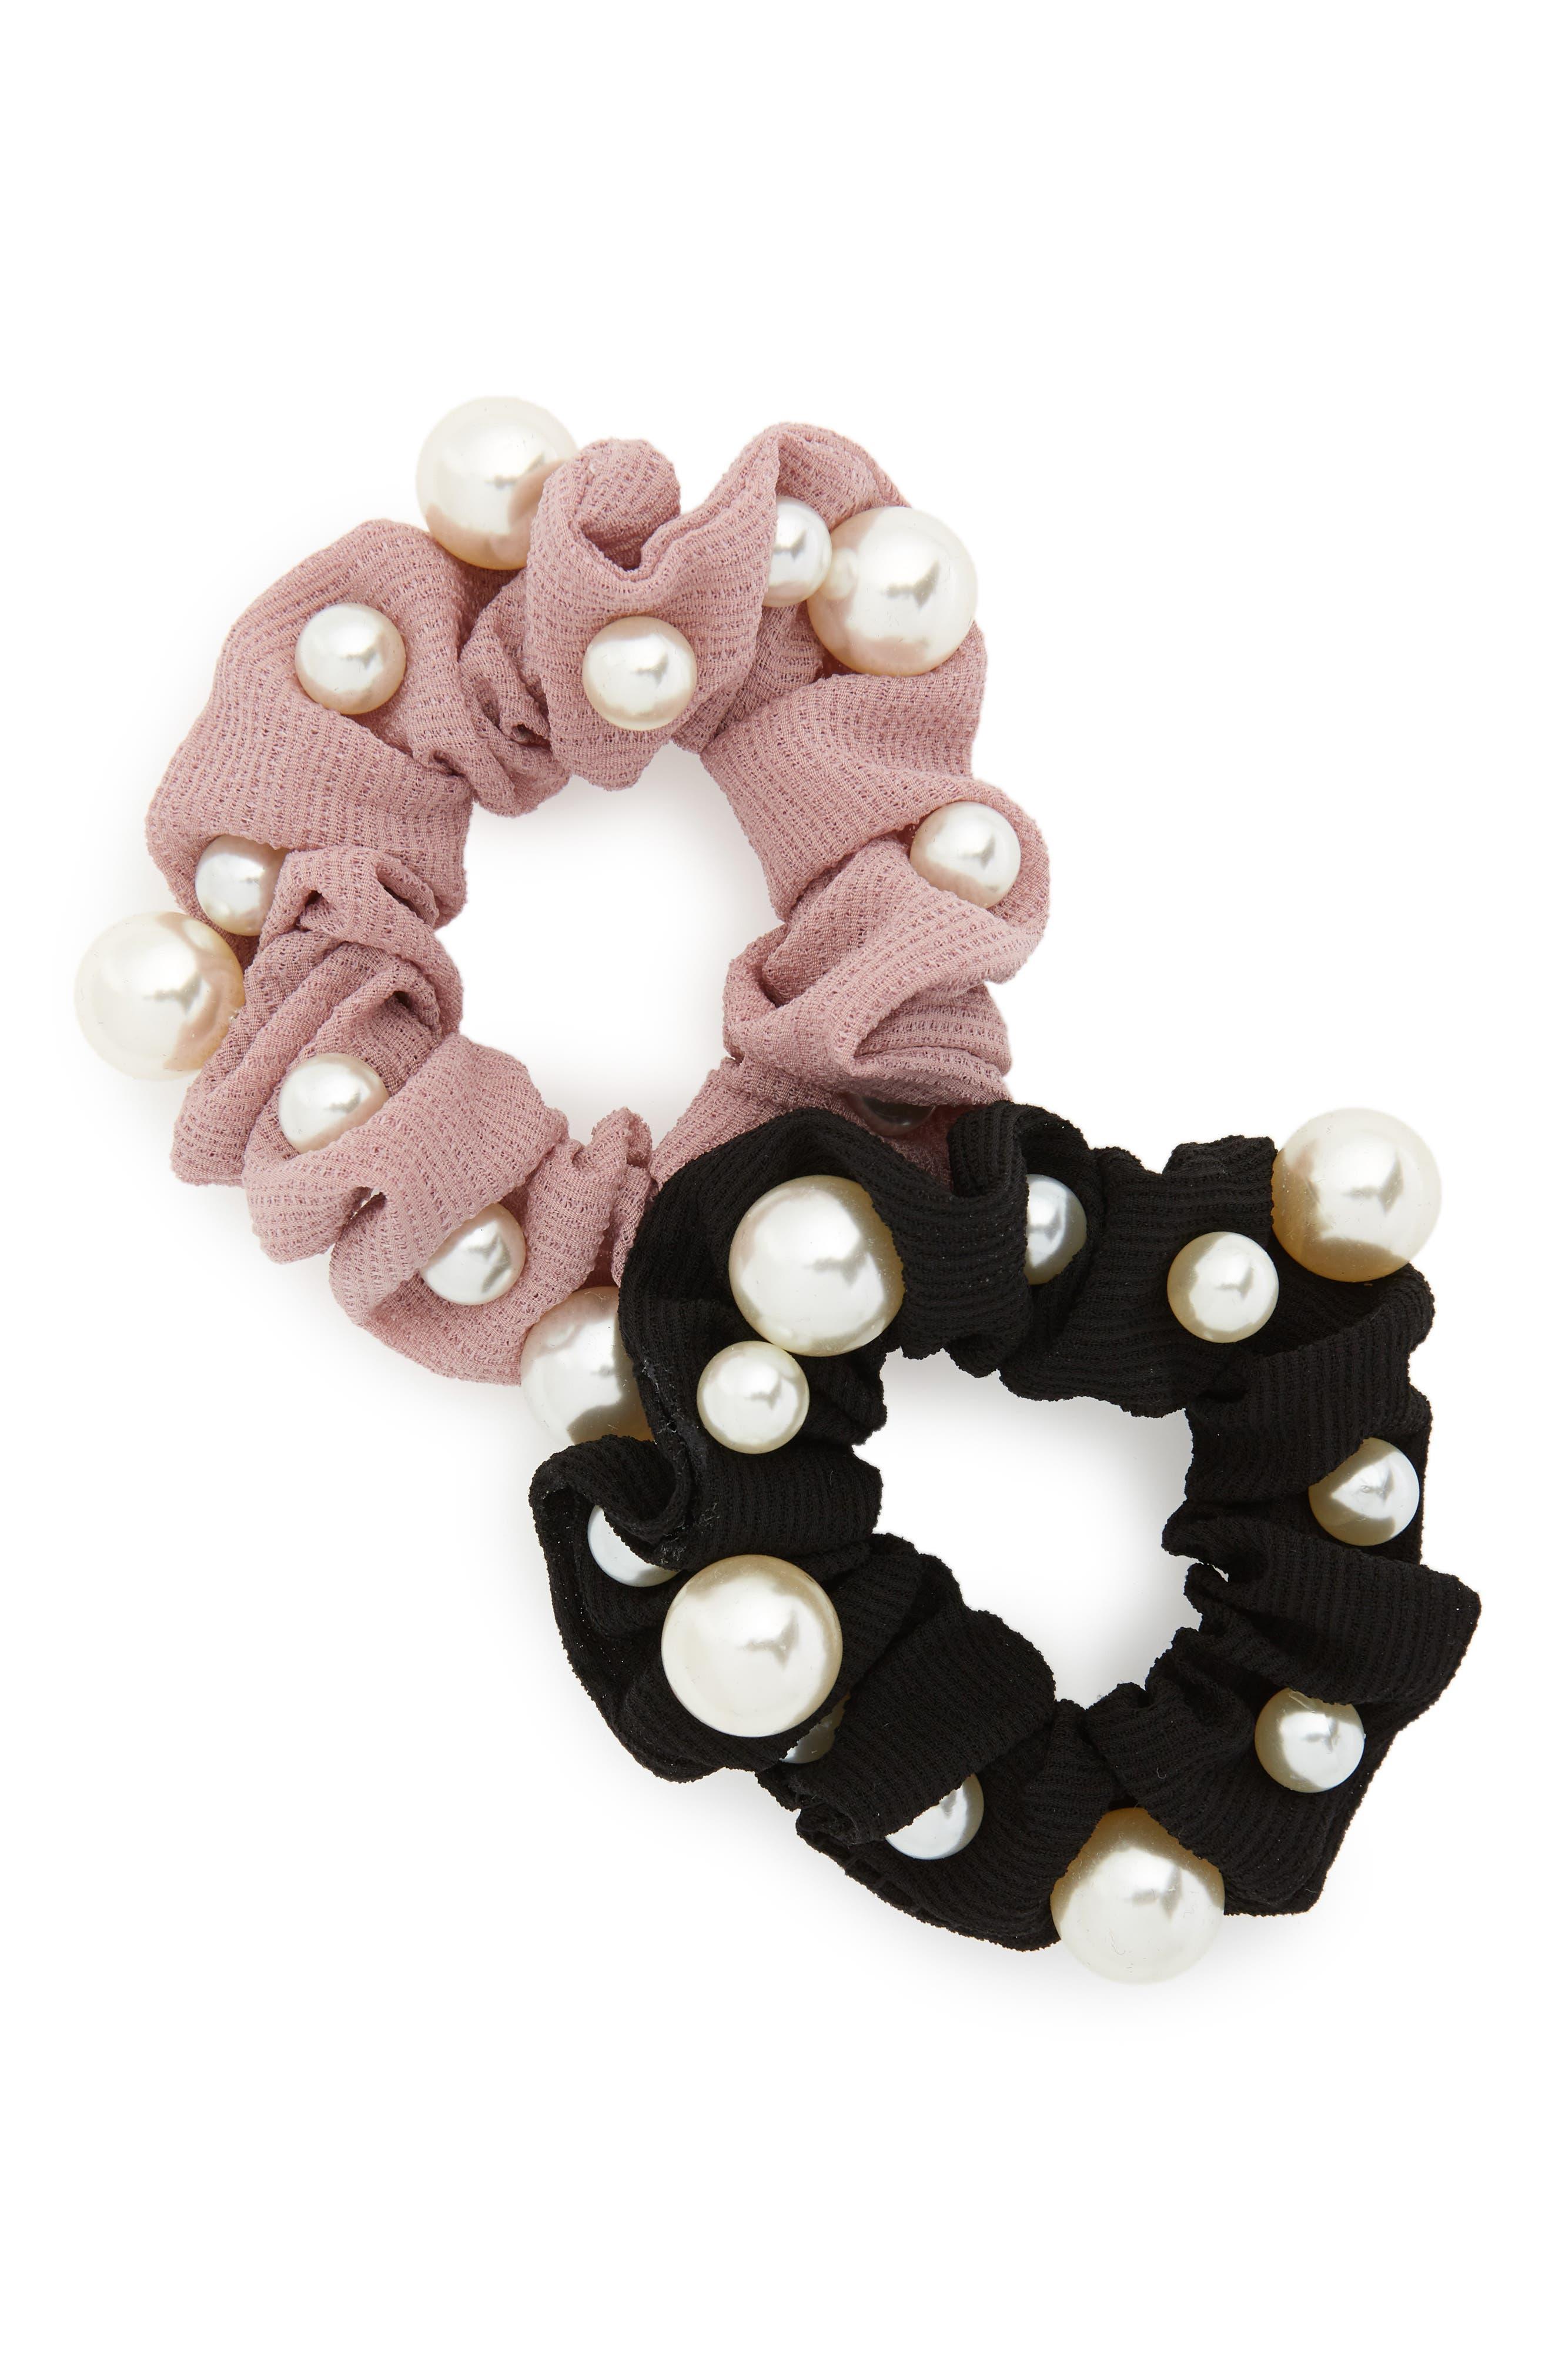 2-Pack Imitation Pearl Scrunchies,                             Main thumbnail 1, color,                             Black/ Pink